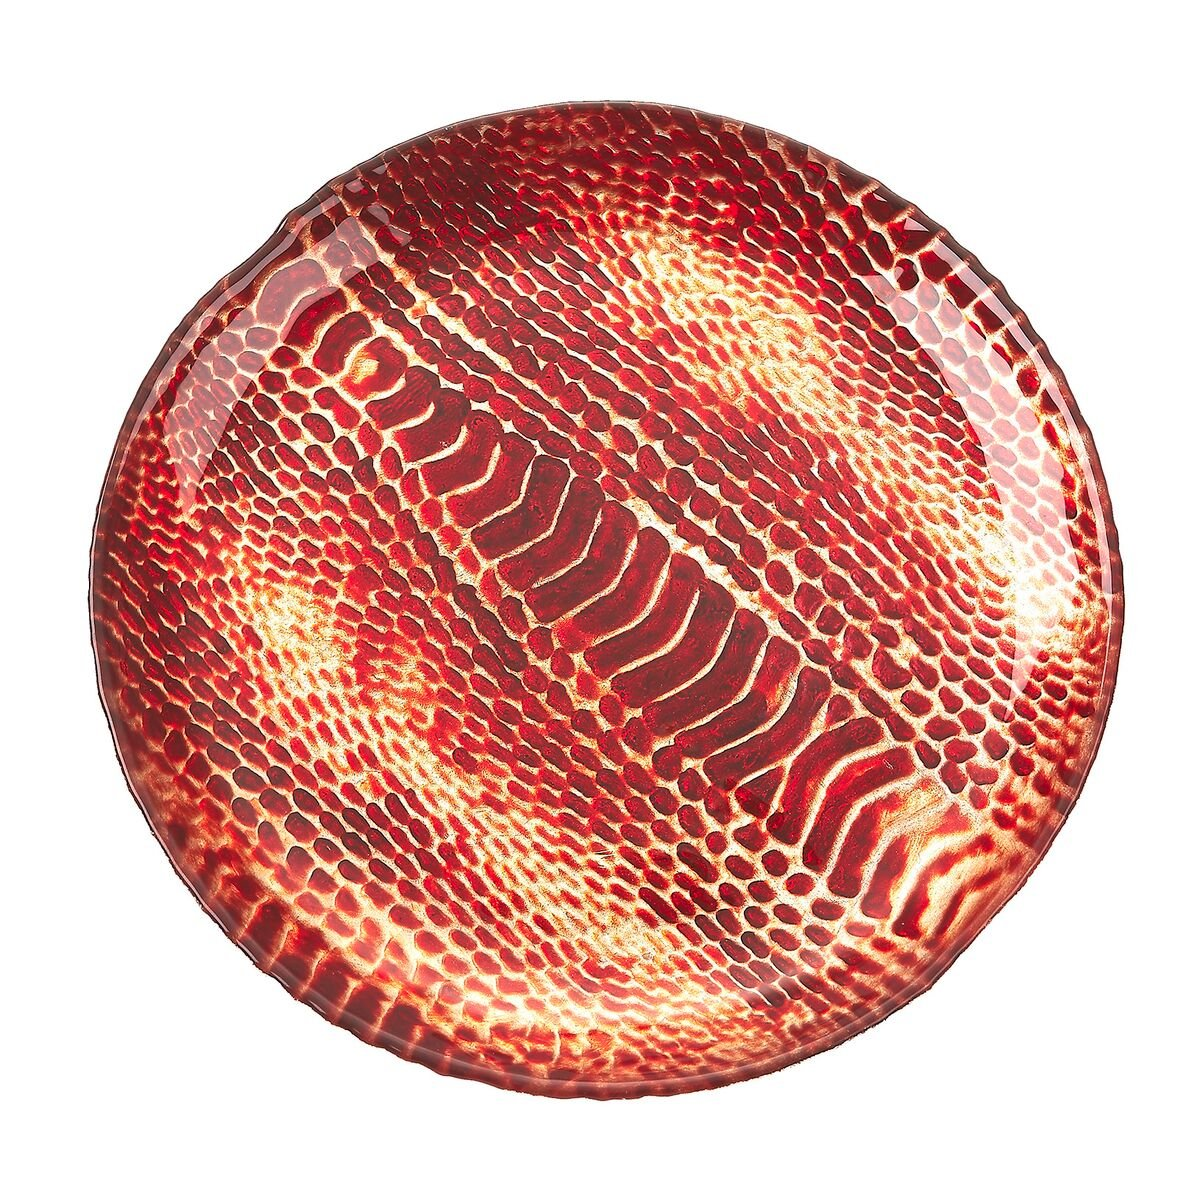 Set of 4 Red Pomegranate 2235-6 Snakeskin Dessert Plates 8.5 Turquoise Gold